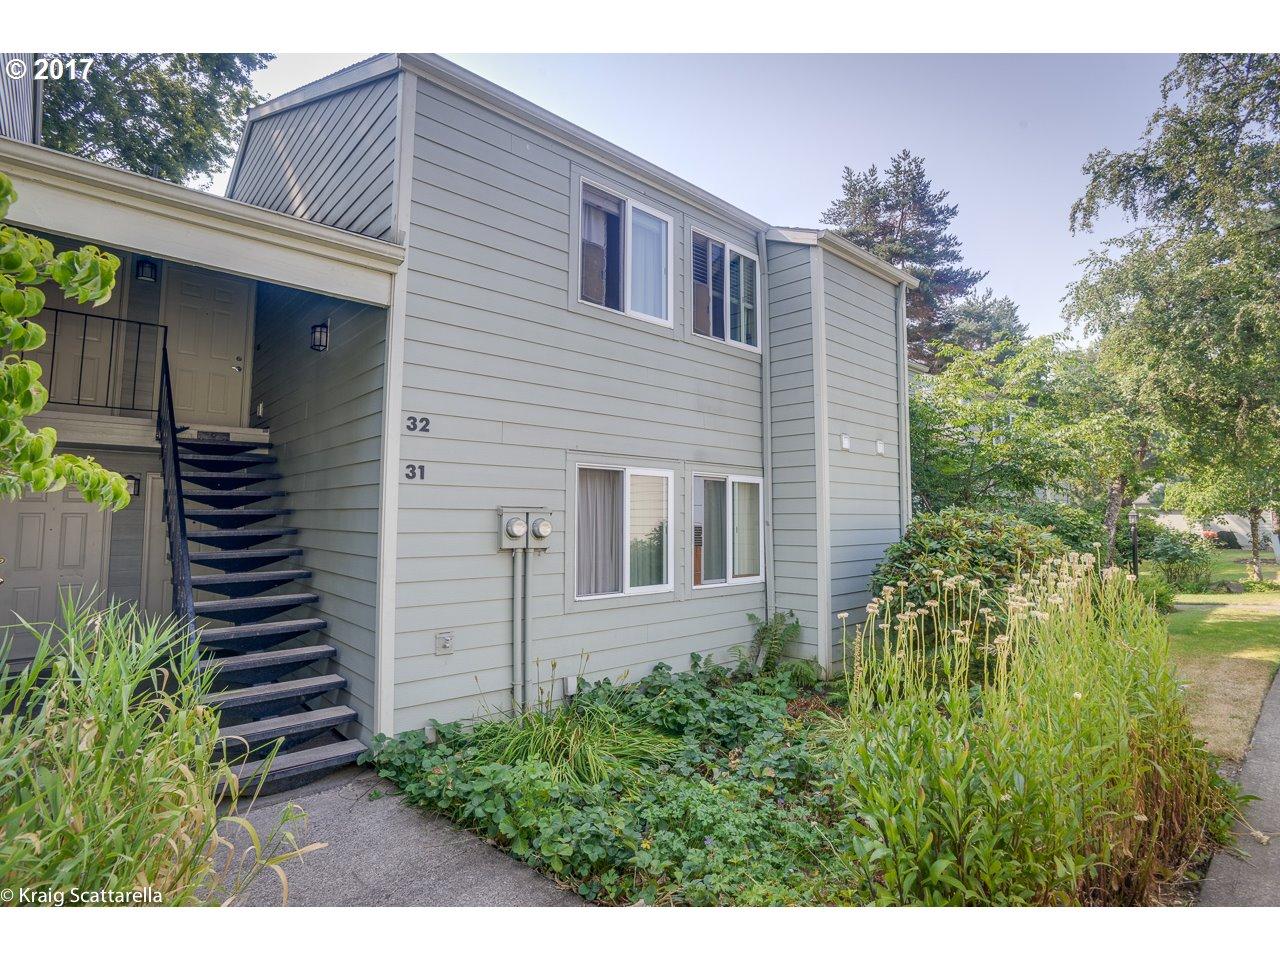 5160 NW NEAKAHNIE AVE 32, Portland, OR 97229